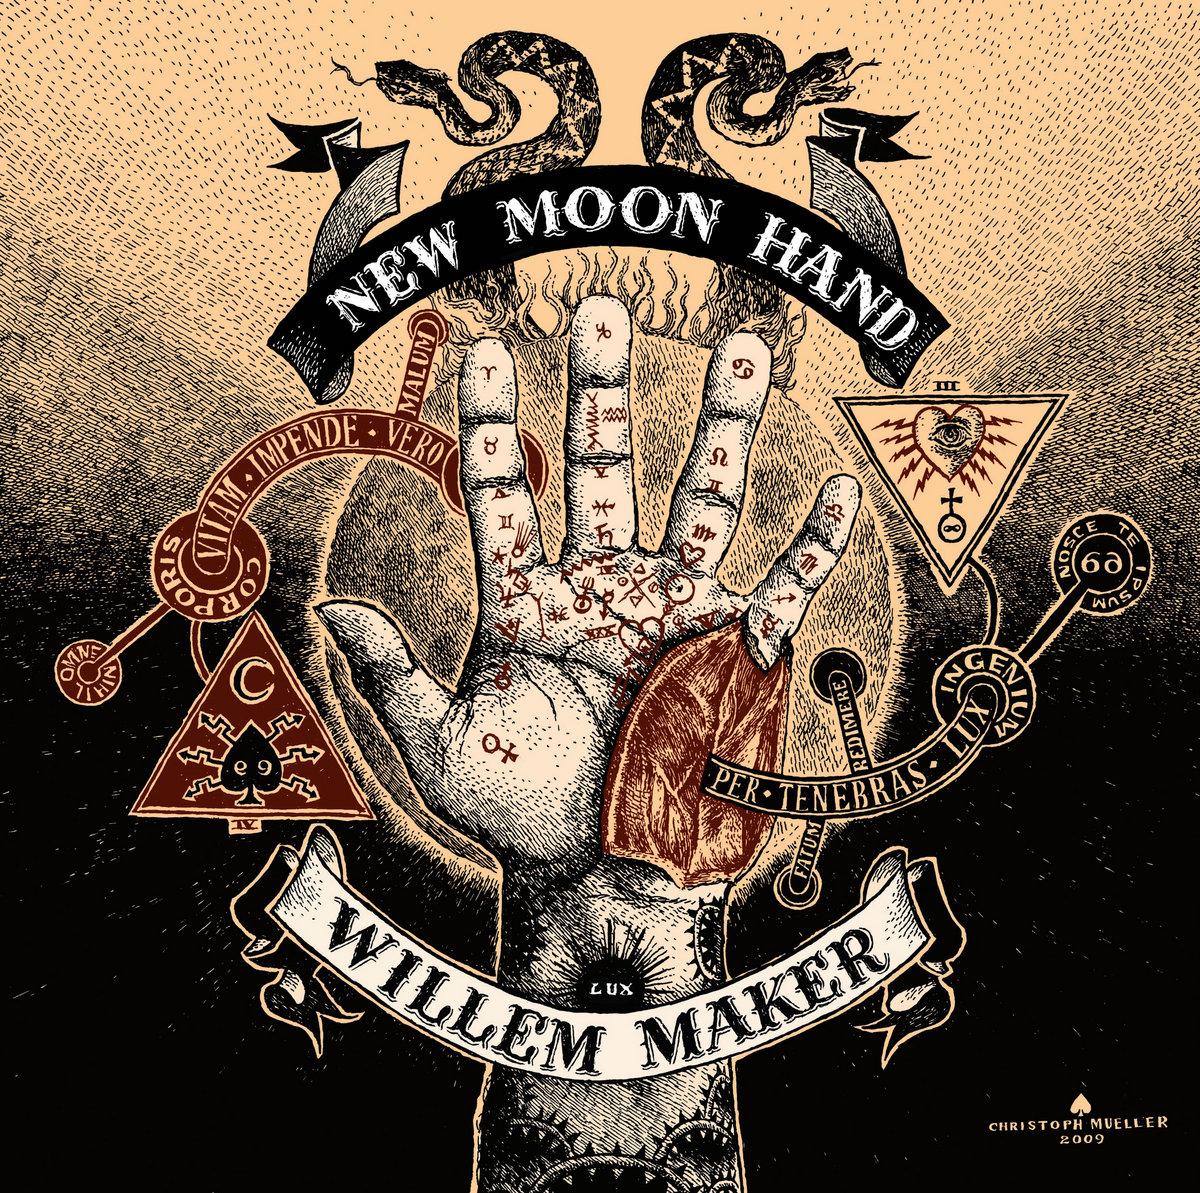 Willem Maker New Moon Hand New Moon Hand Cover Art